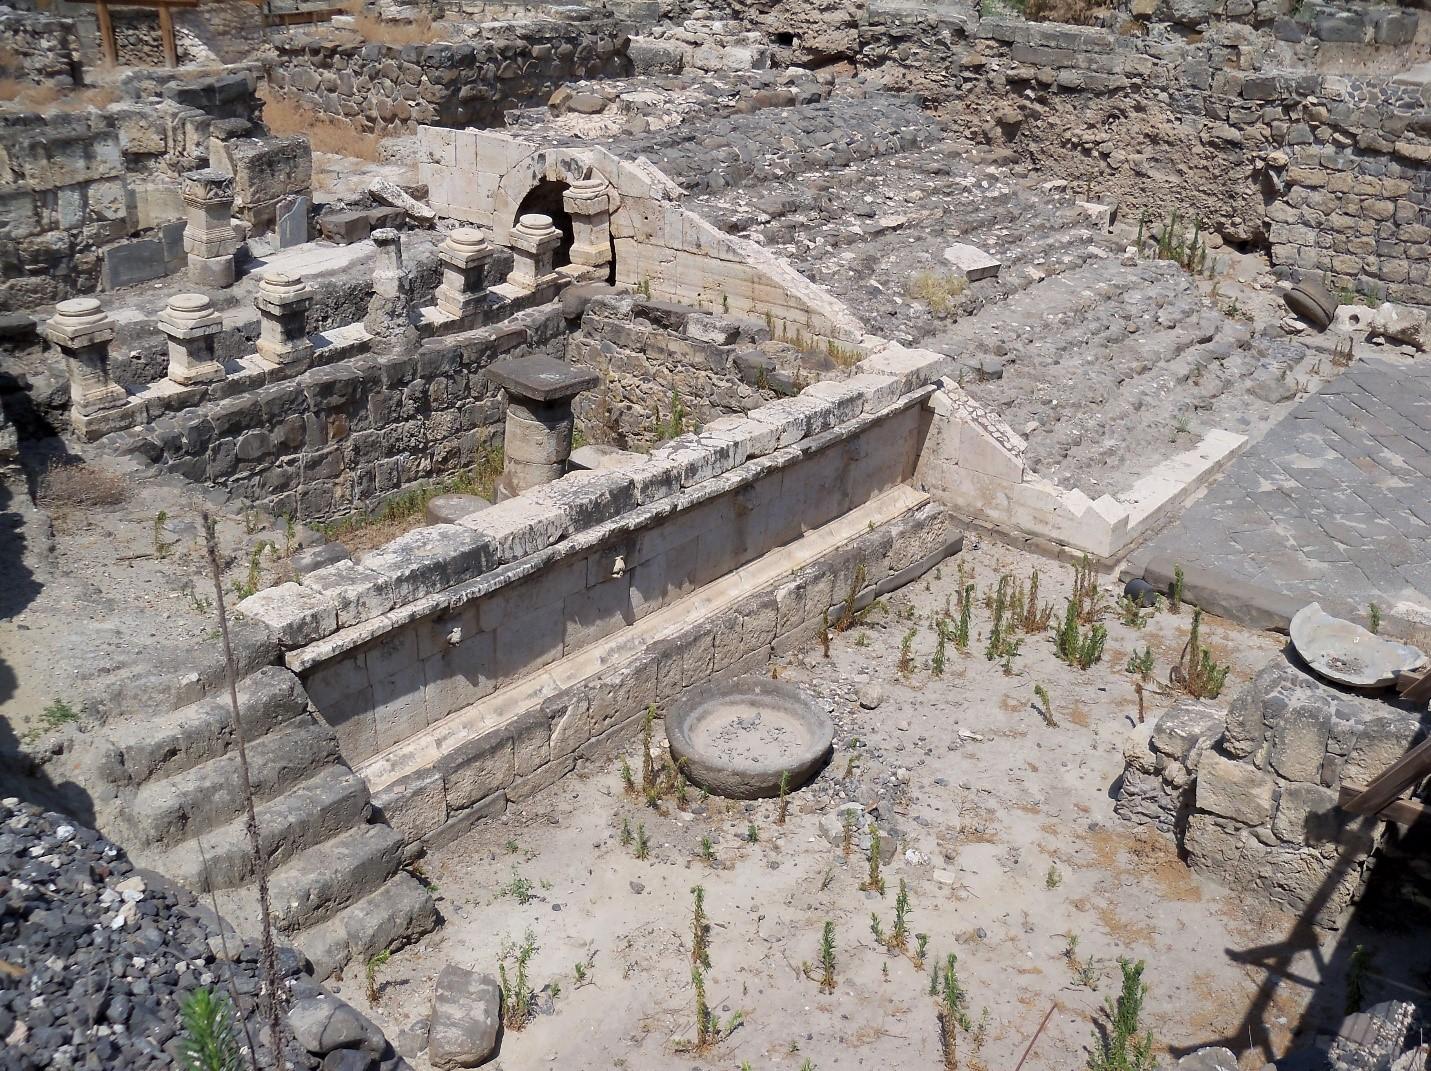 Ceremonial washing area in Roman-era temple